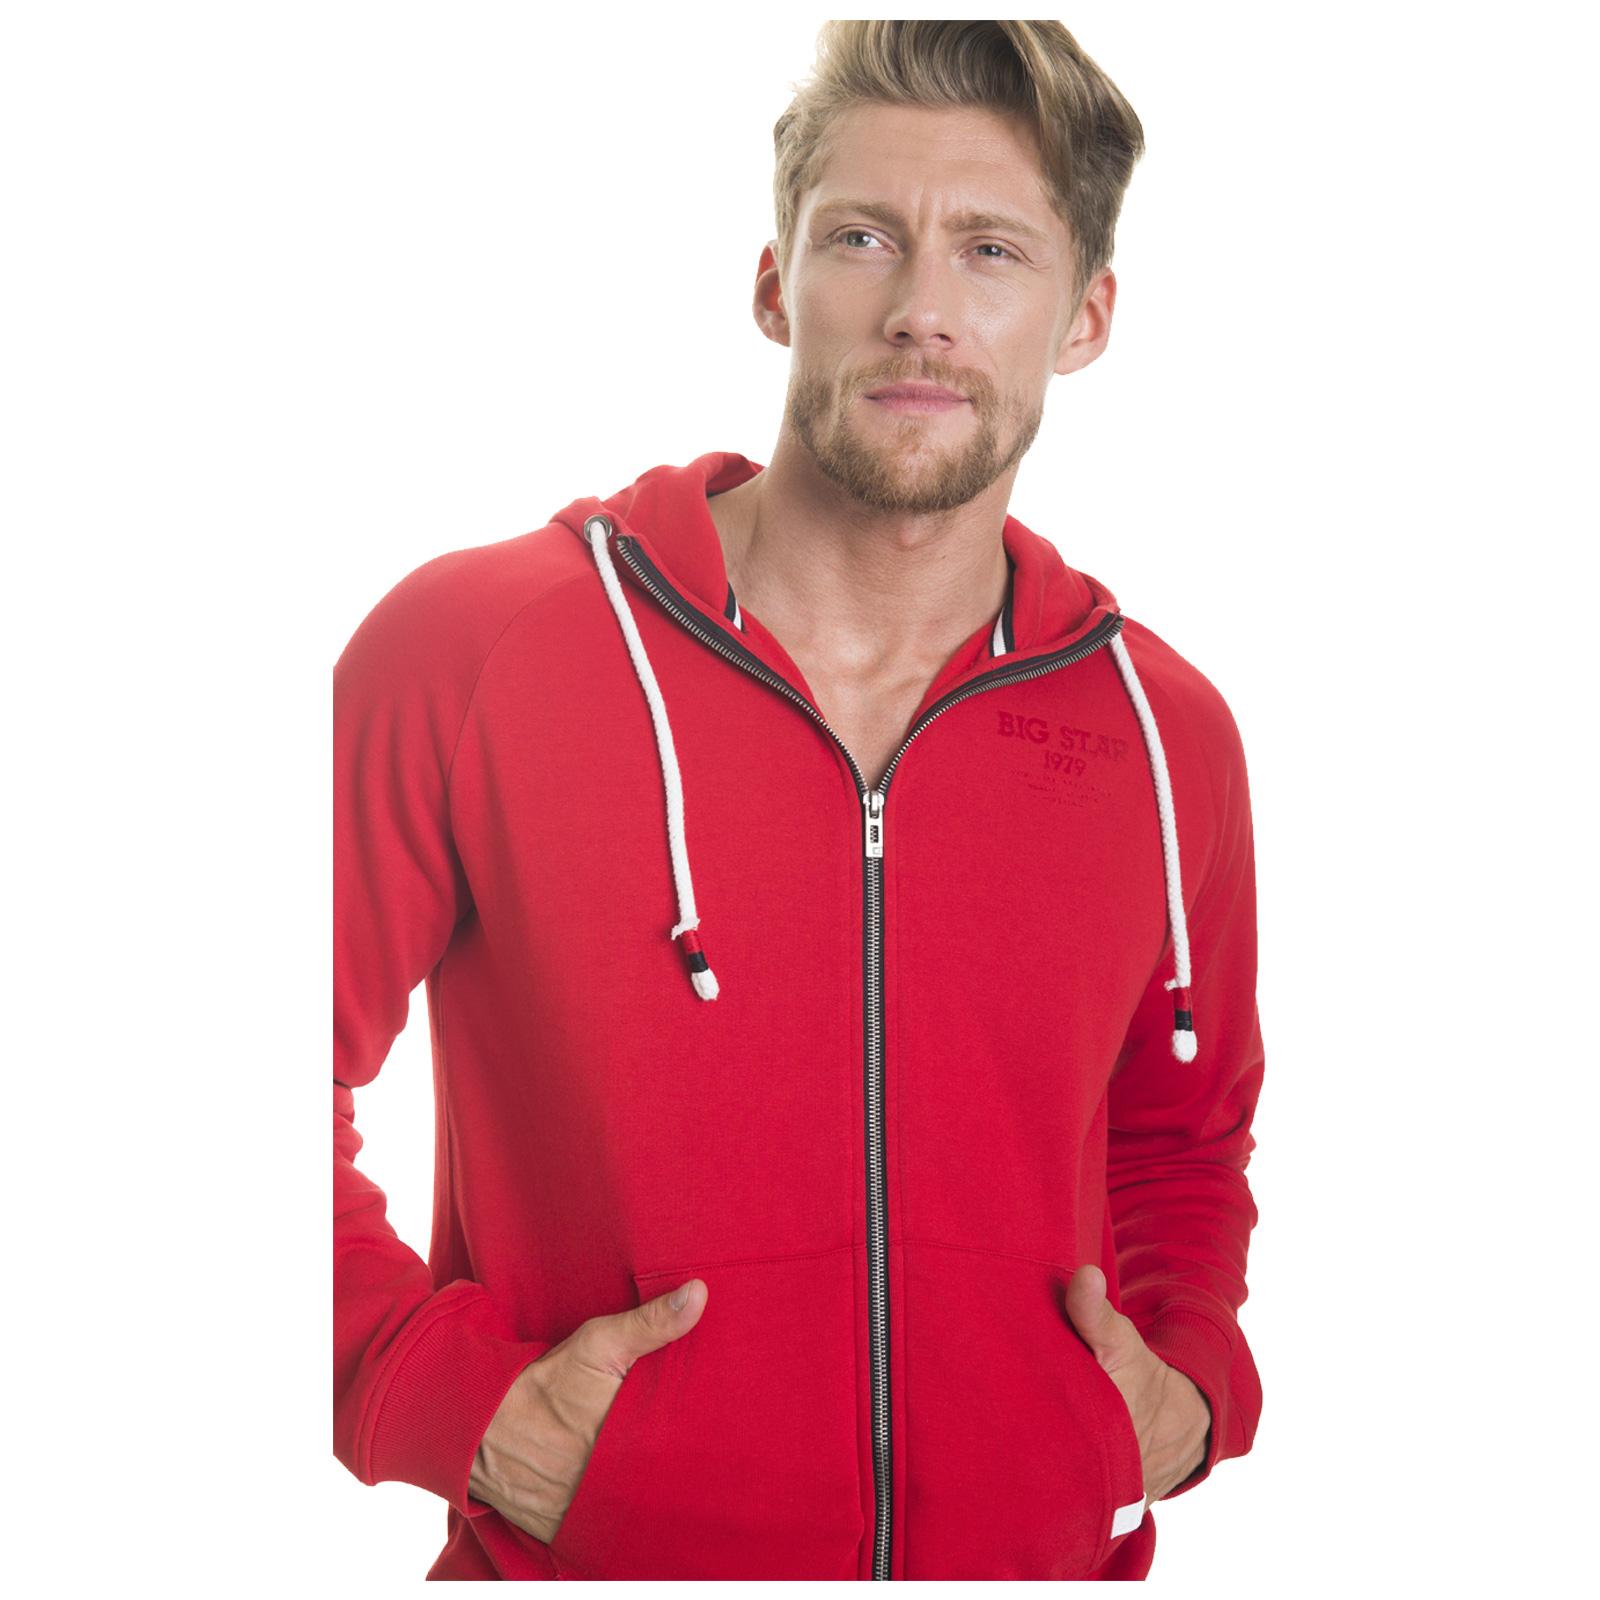 Big-Star-Mens-Hoodie-New-Cotton-Pullover-Full-Zip-Hooded-Casual-Sweatshirt thumbnail 12